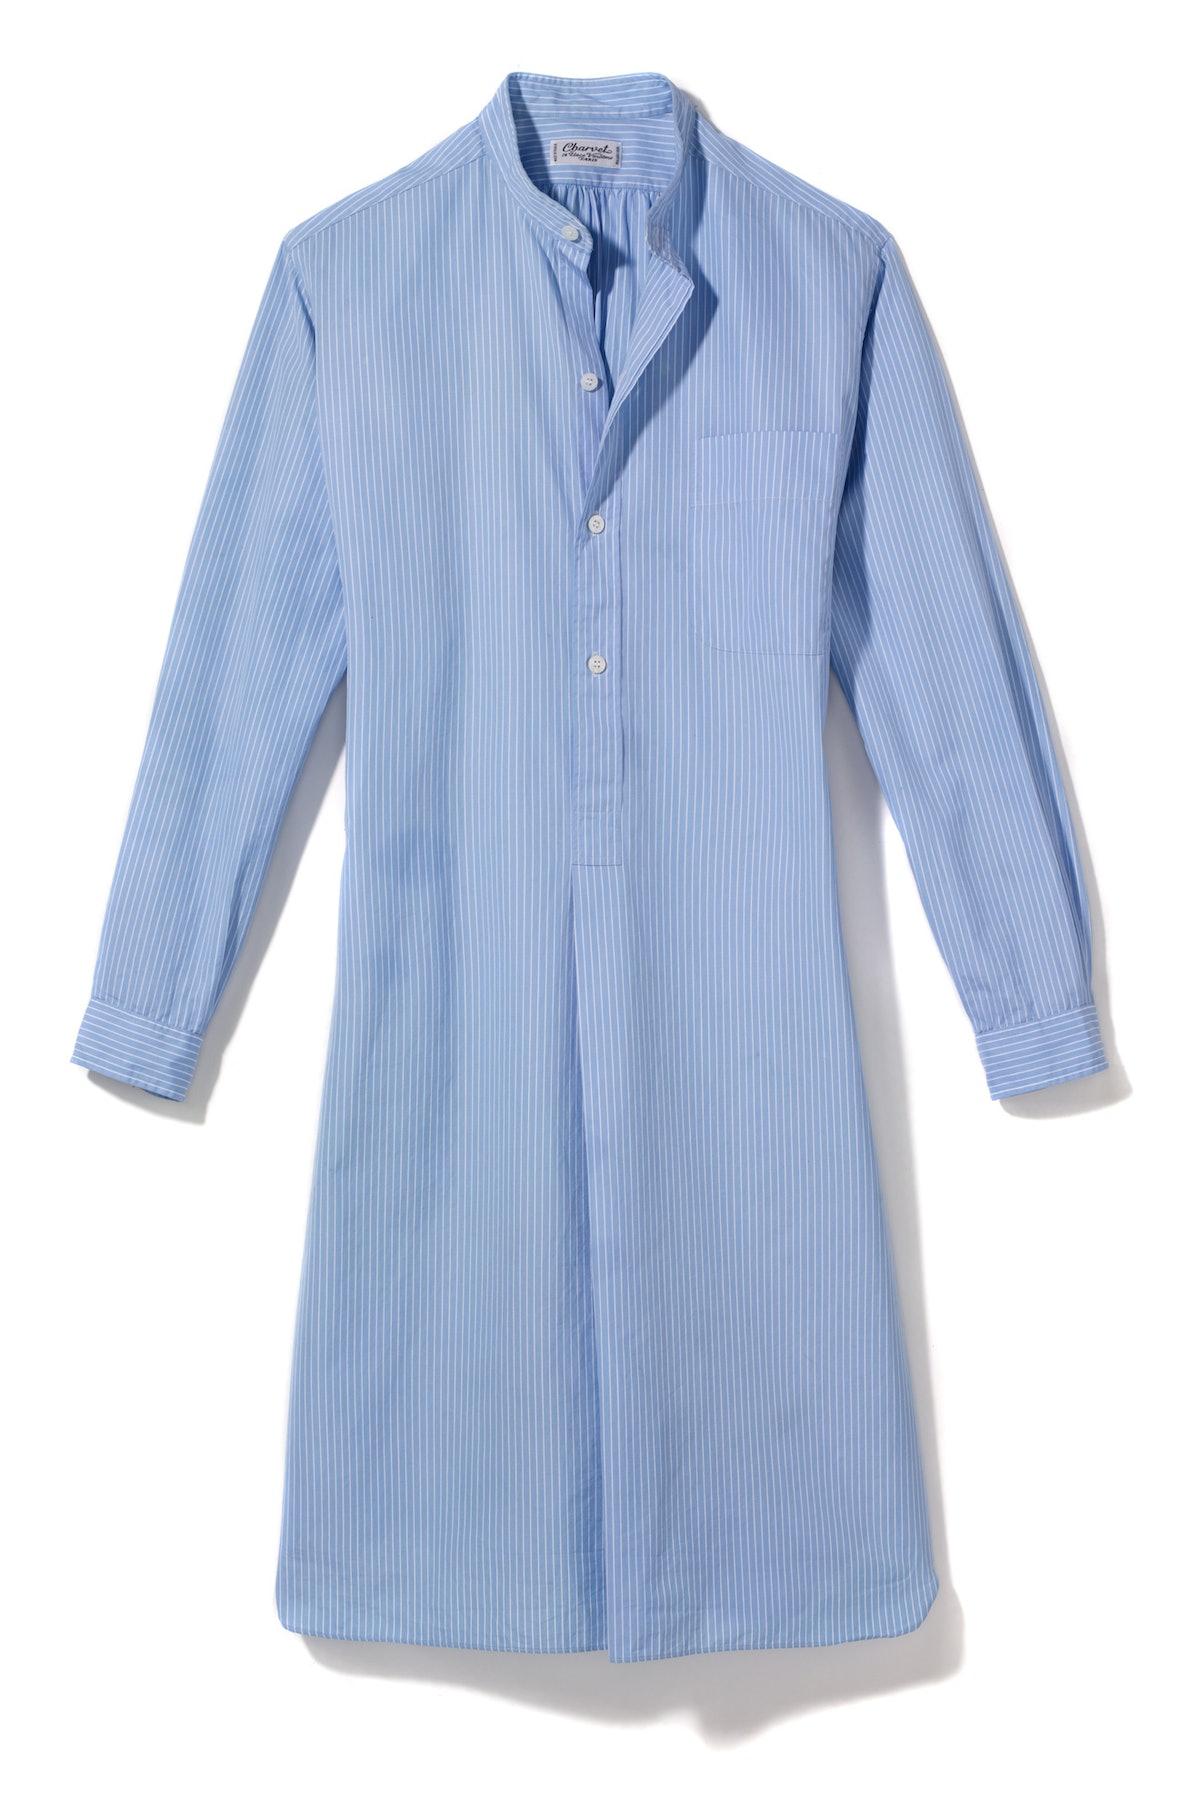 Charvet nightshirt